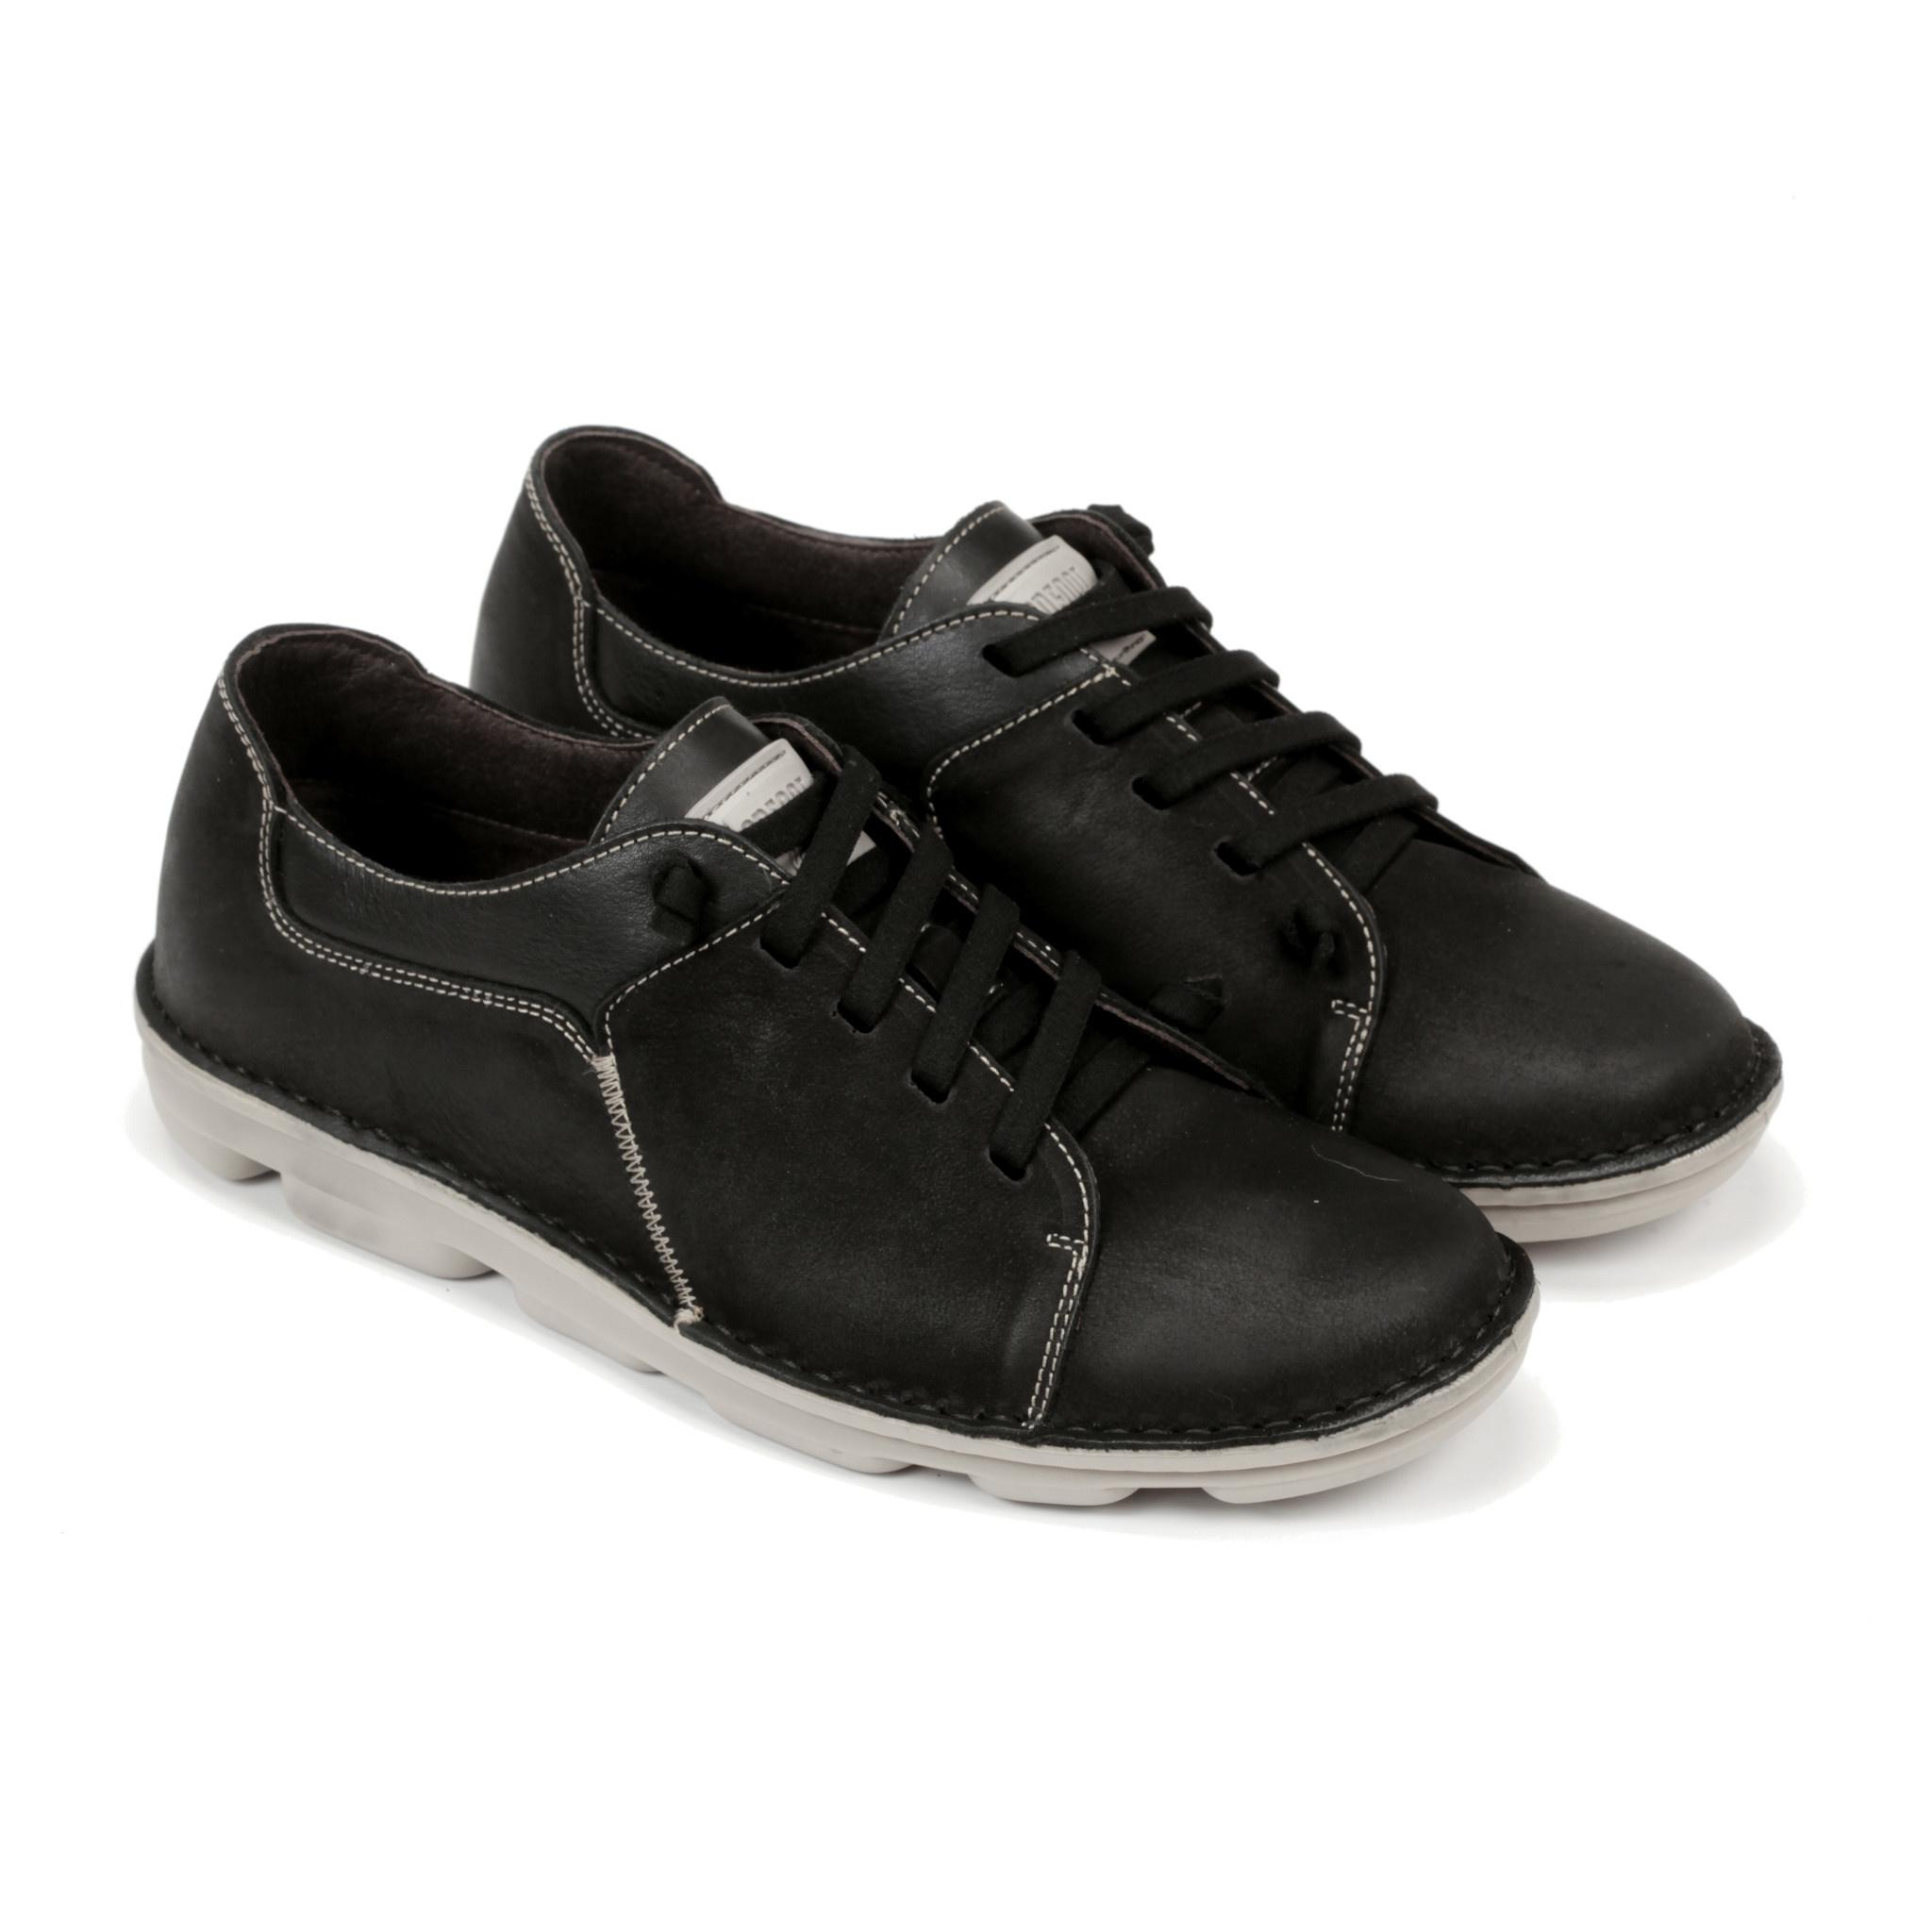 On Foot On Foot - 7042 Men shoes - Black